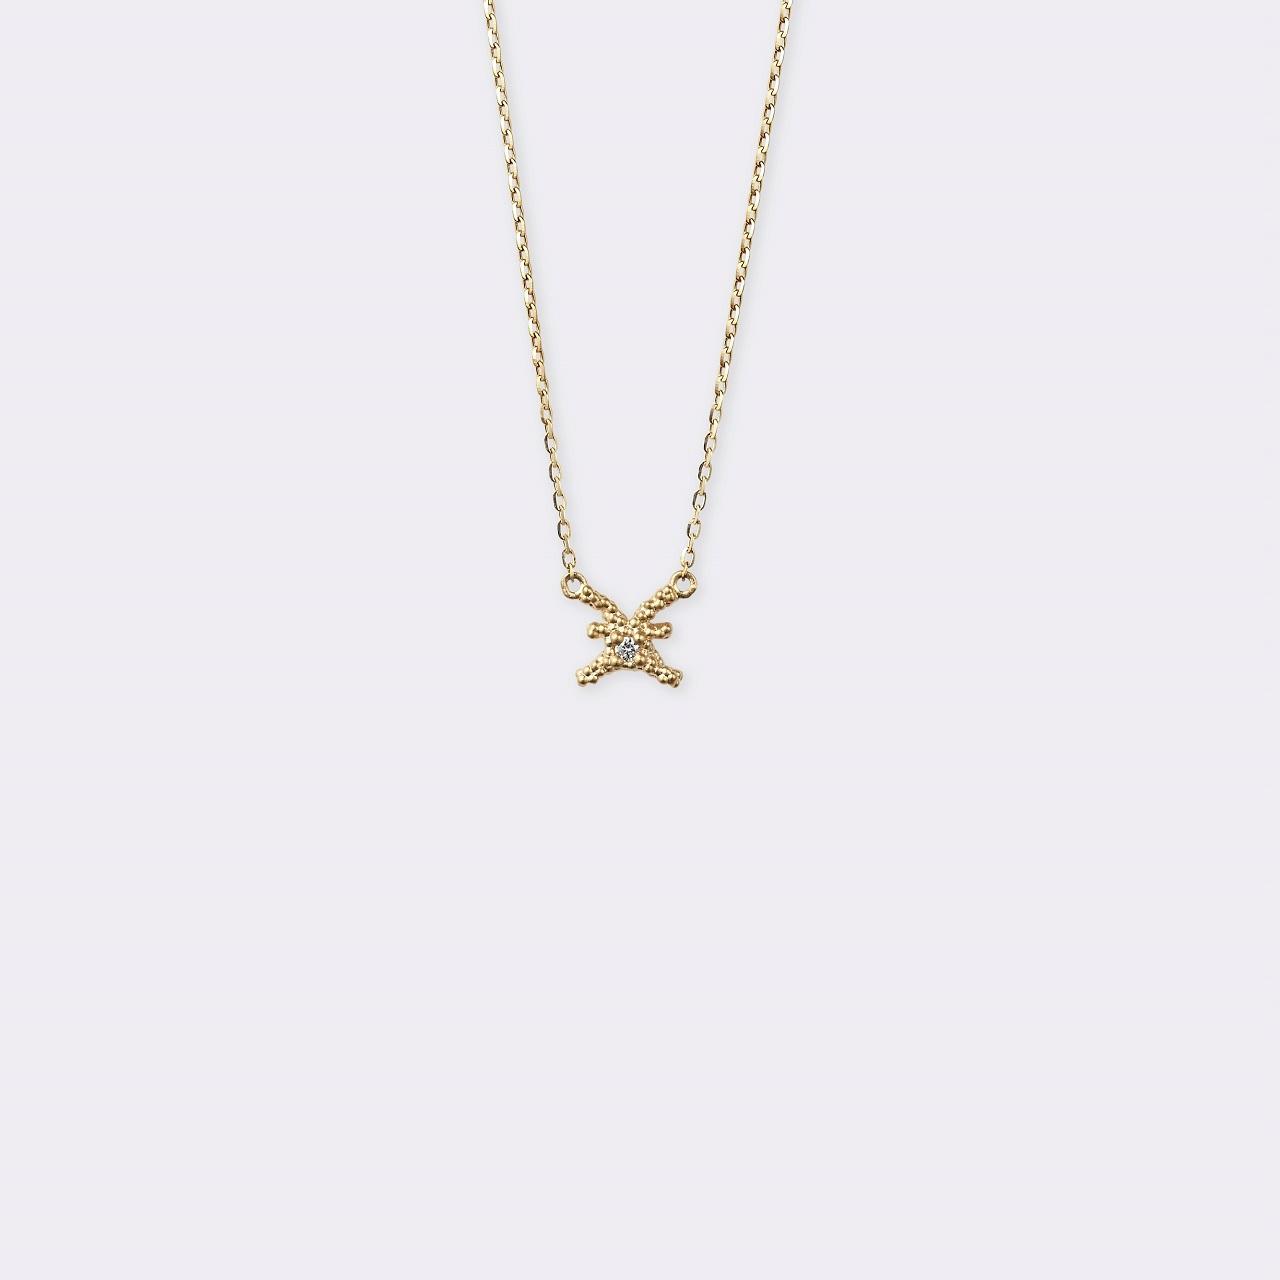 Horoscope Necklace 魚座 K18YG(ホロスコープネックレス うお座 K18イエローゴールド)